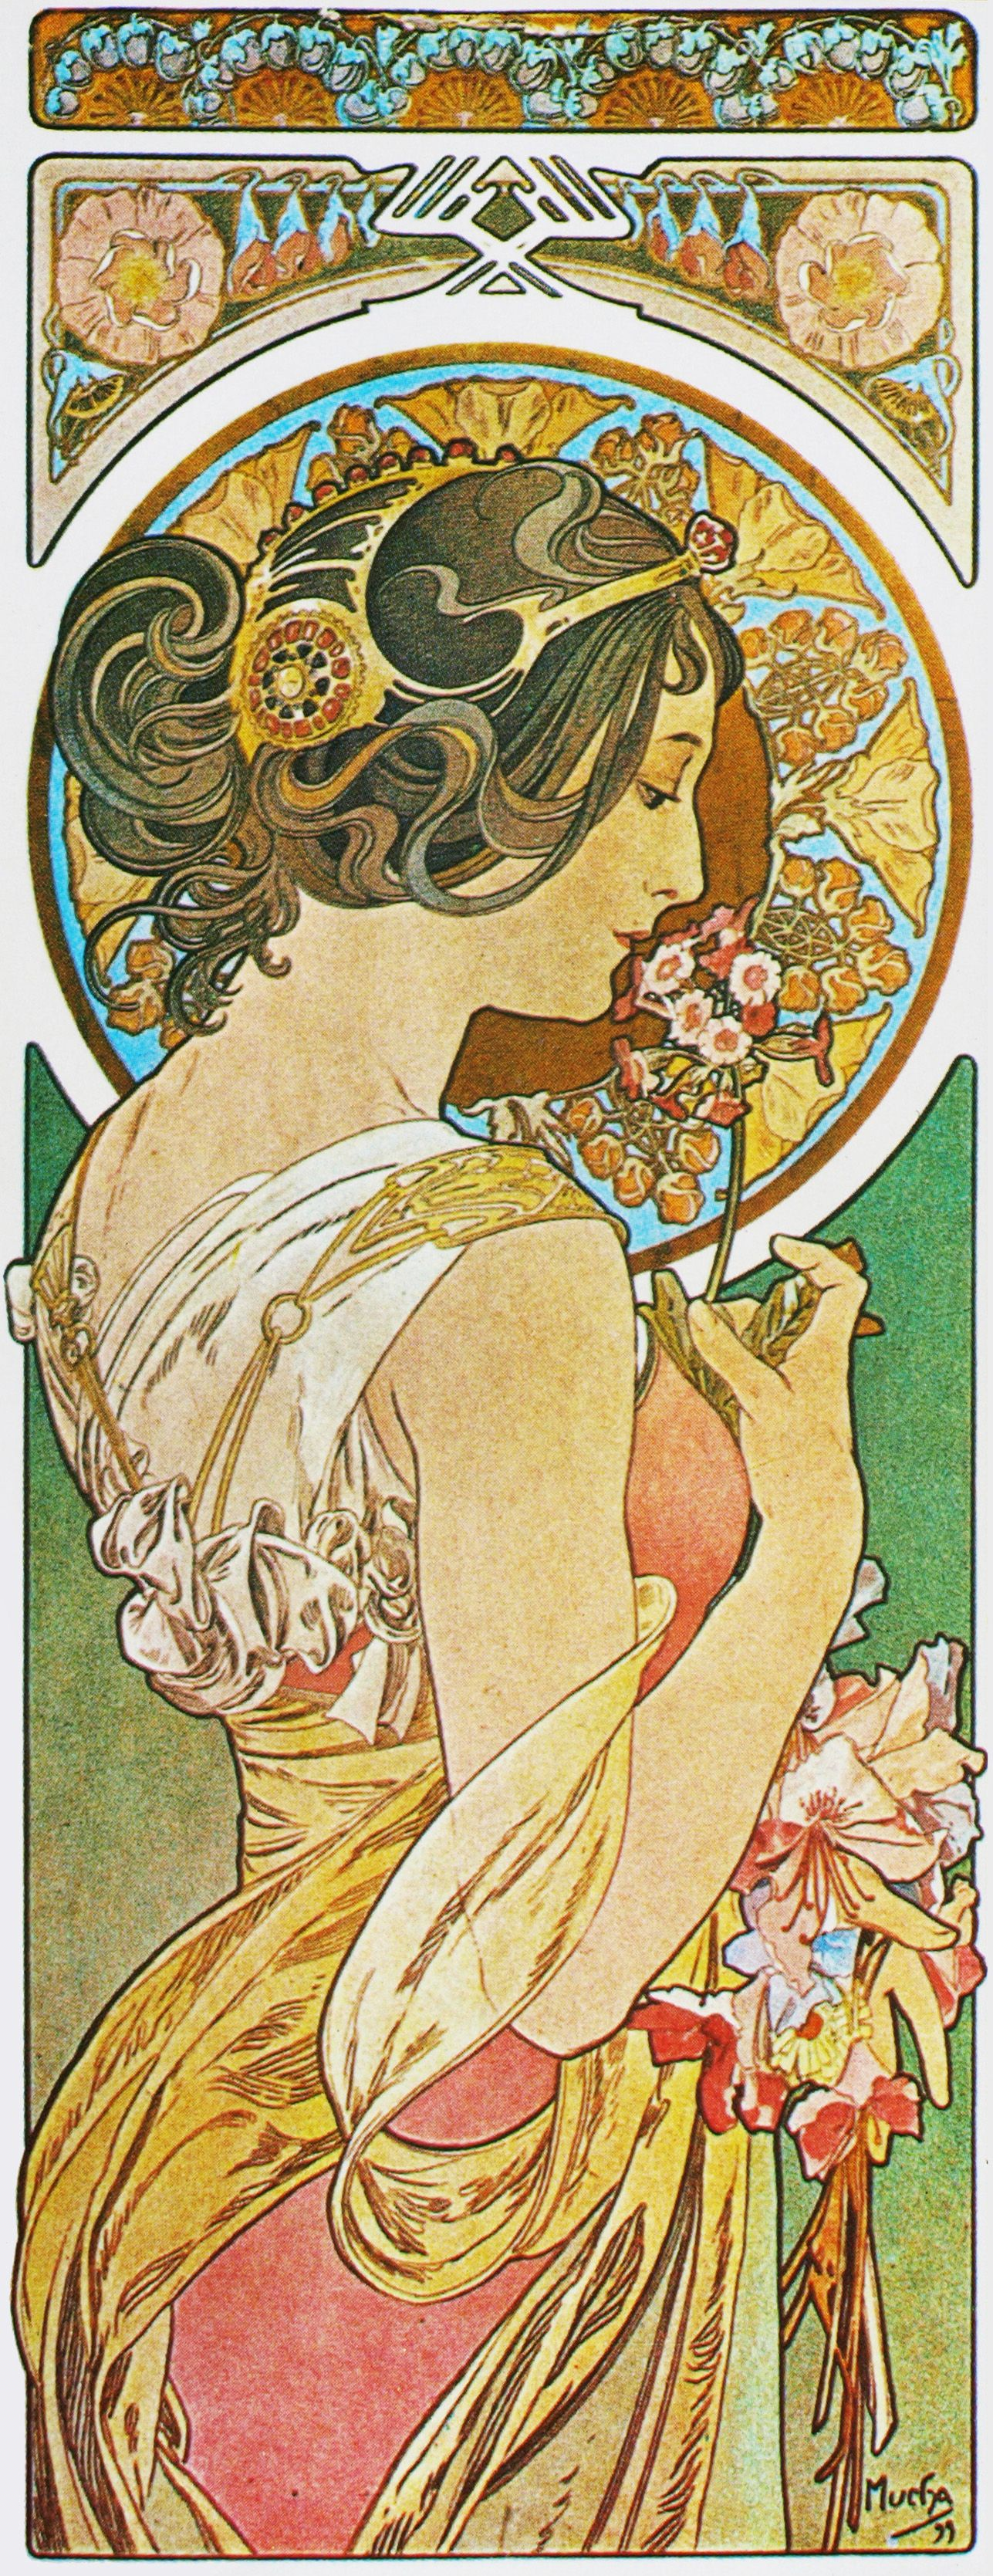 Alphonse Mucha - Art Nouveau | Art History | Pinterest